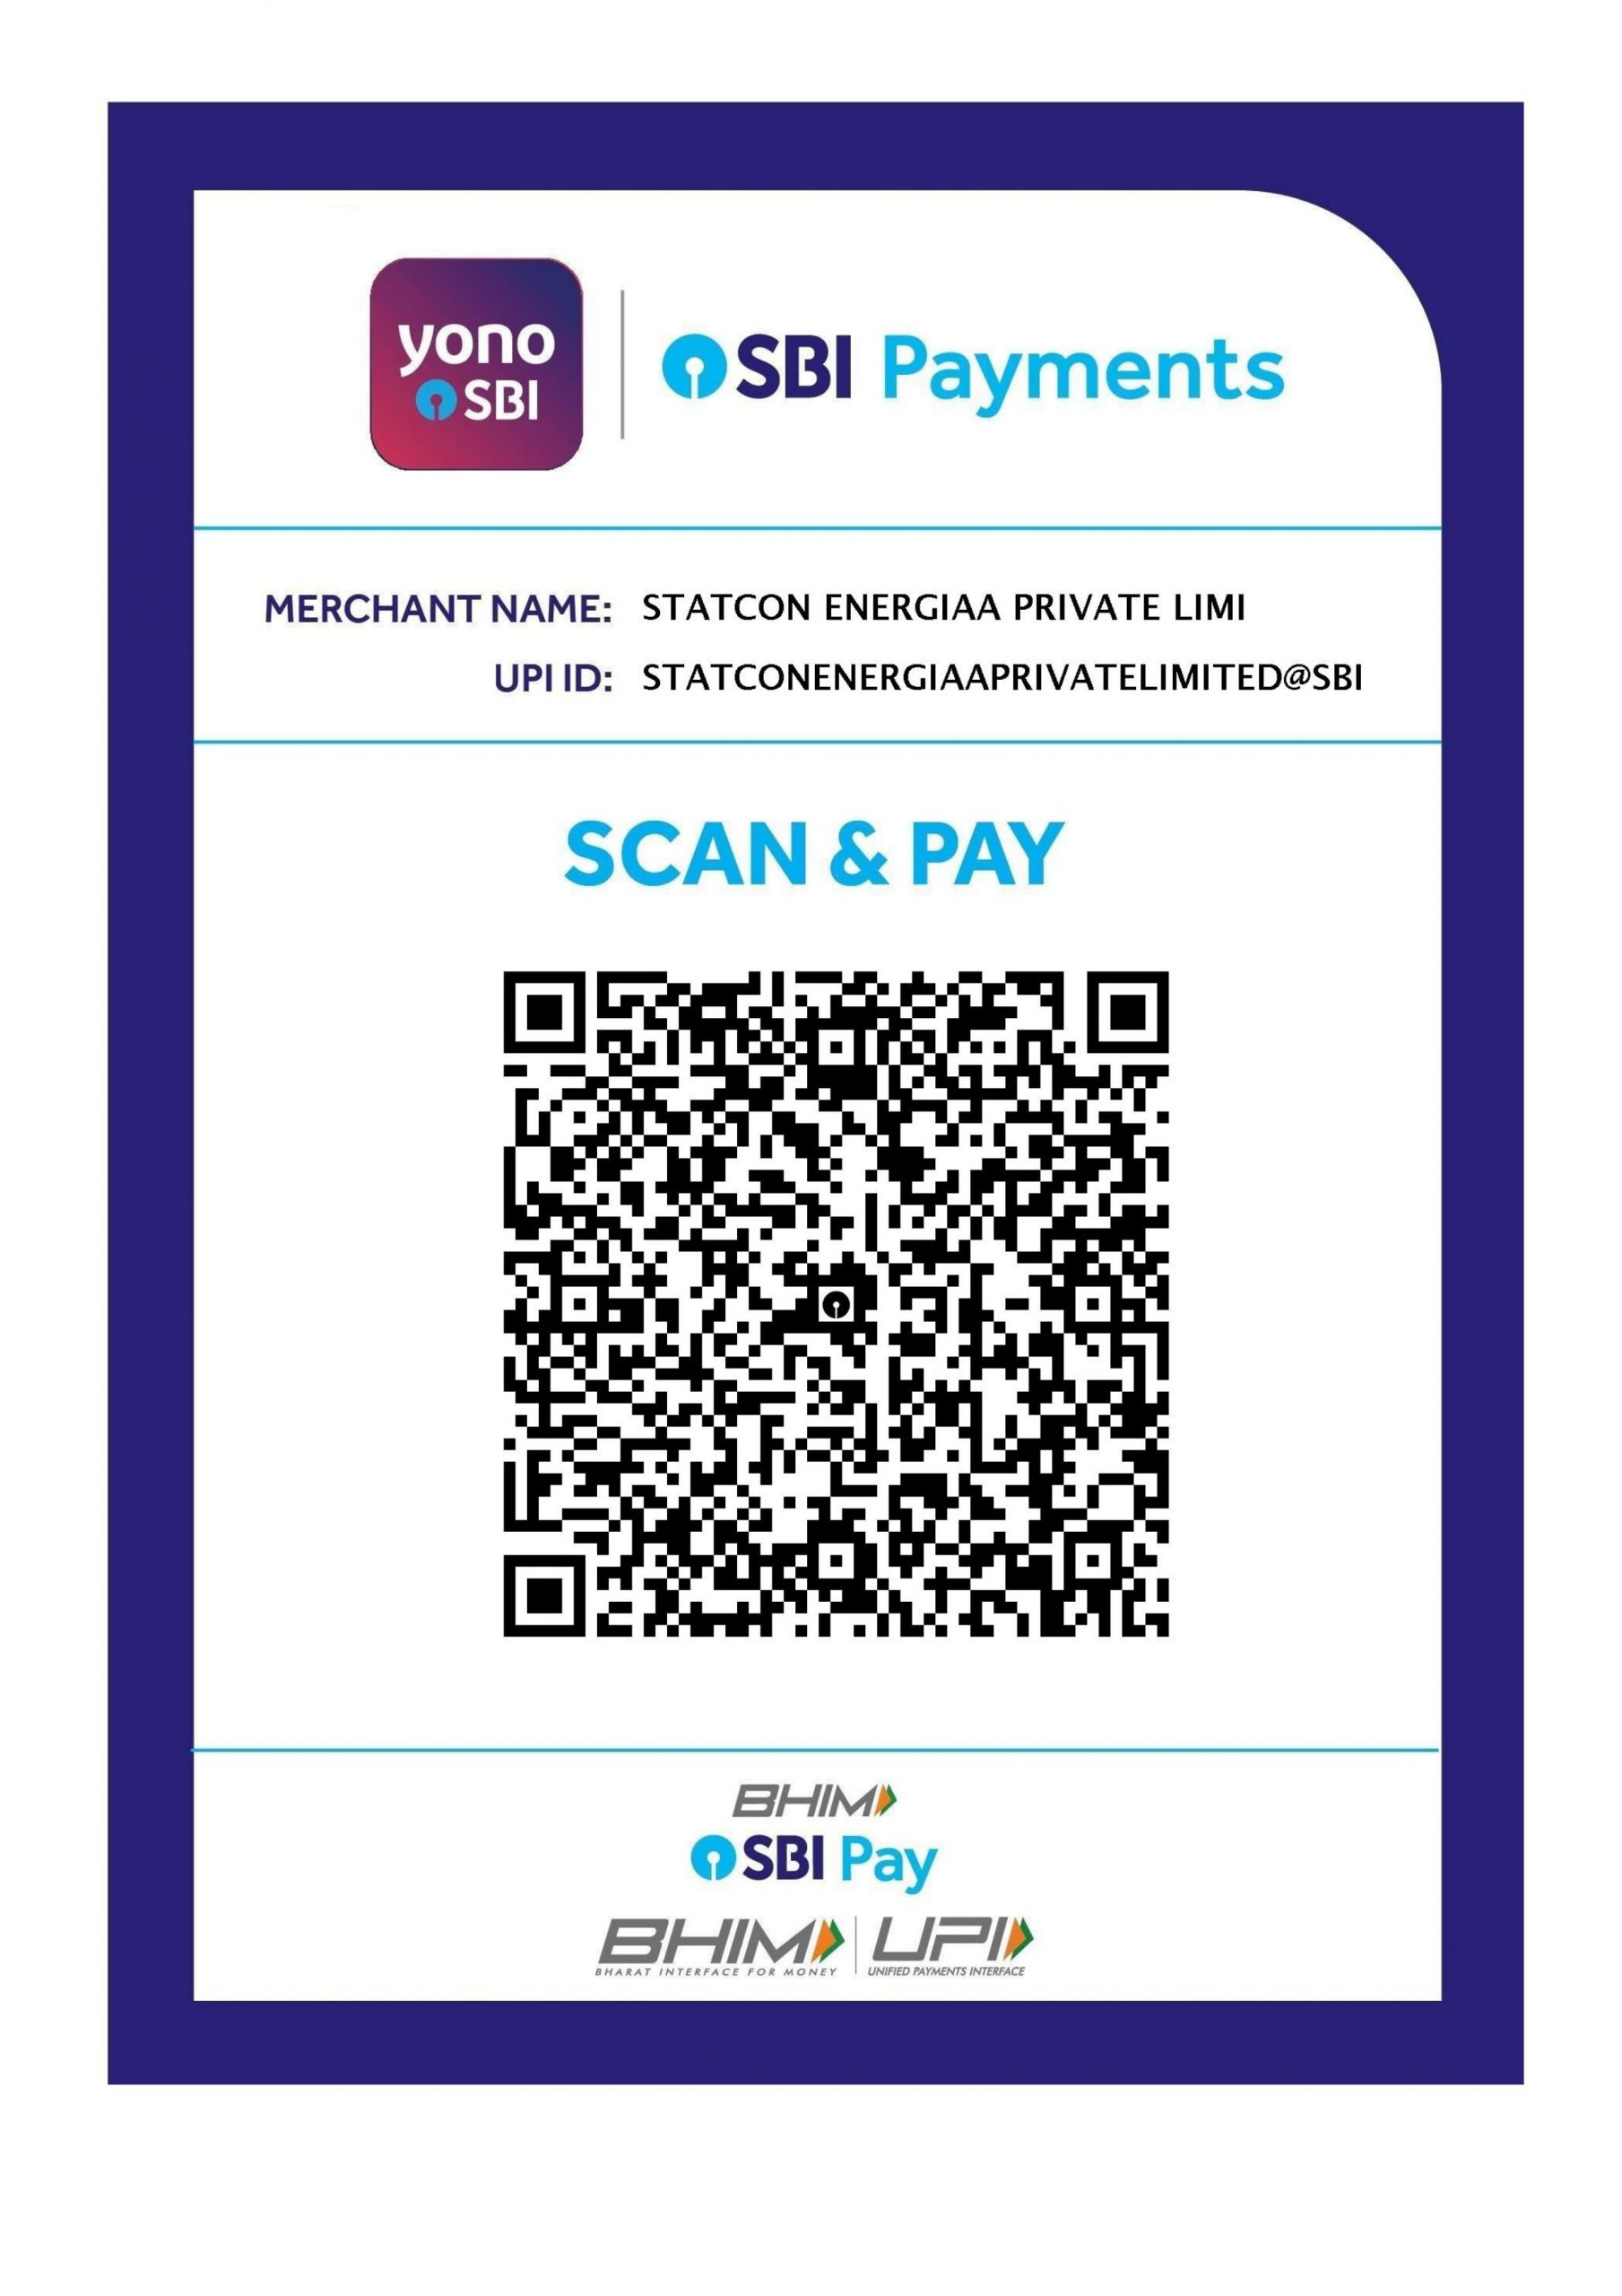 Payment QR Code Statcon Energiaa